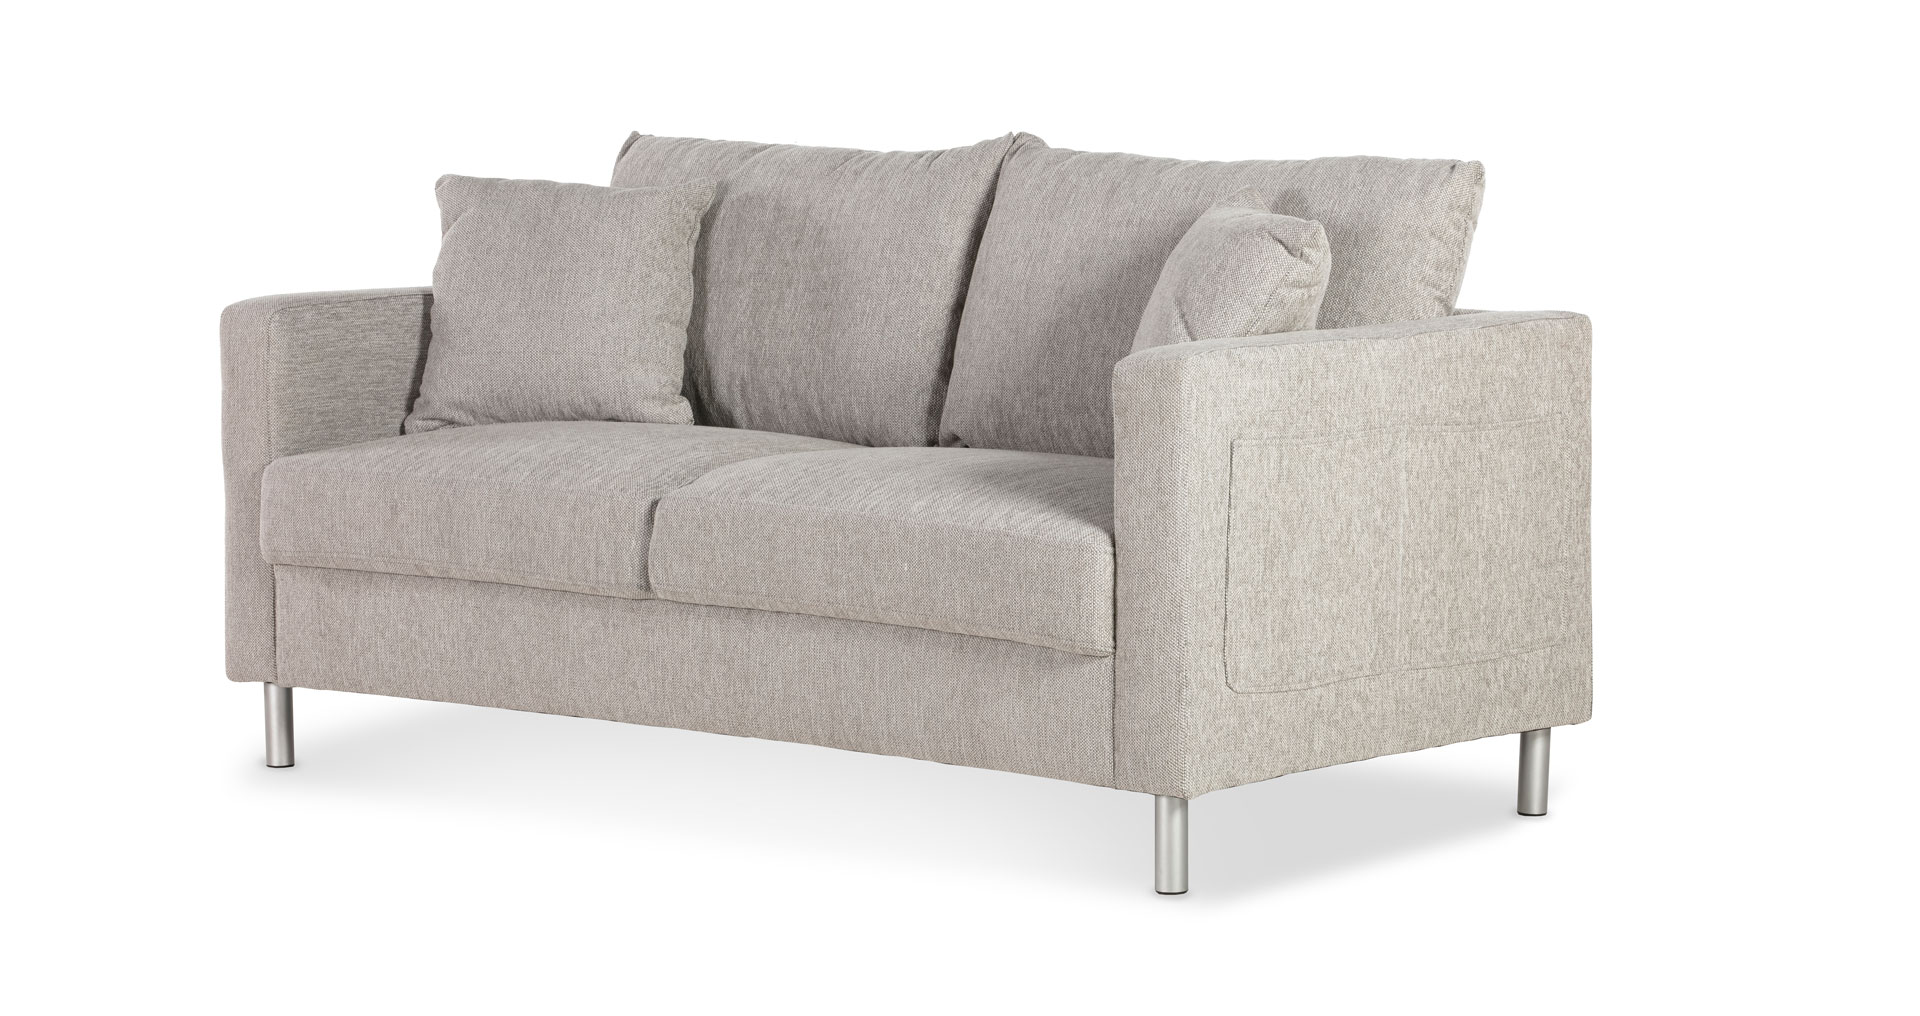 "ספה אניסטון 165 ס""מ בגוון אפור סקנדינבי"